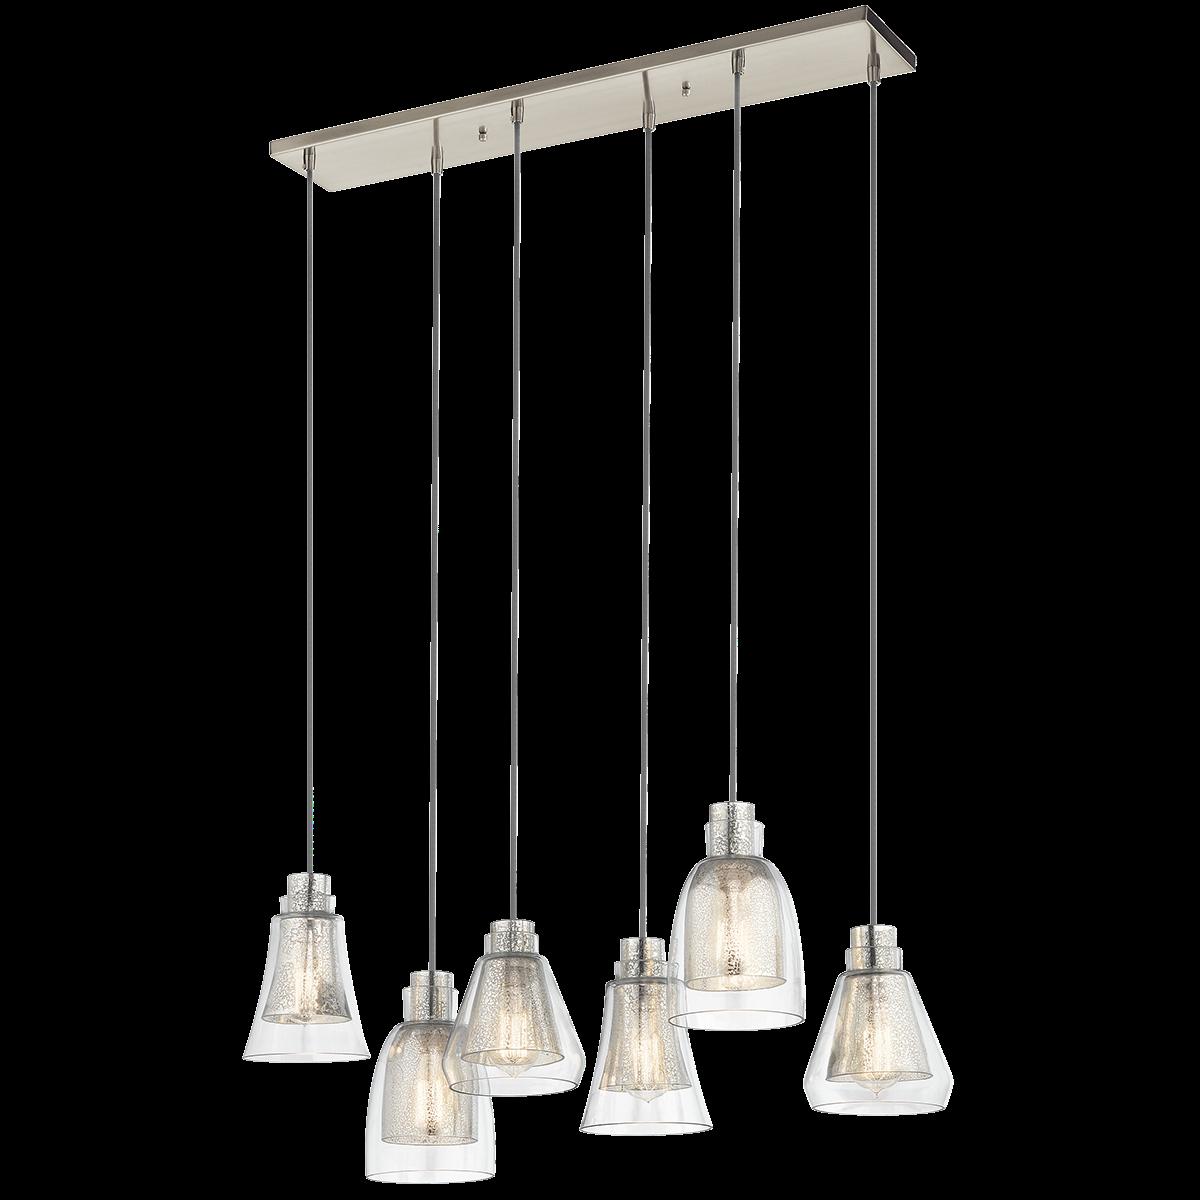 Kitchen chandelier 1 table evie 6 light chandelier brushed kitchen chandelier 1 table evie 6 light chandelier brushed nickel ni arubaitofo Images